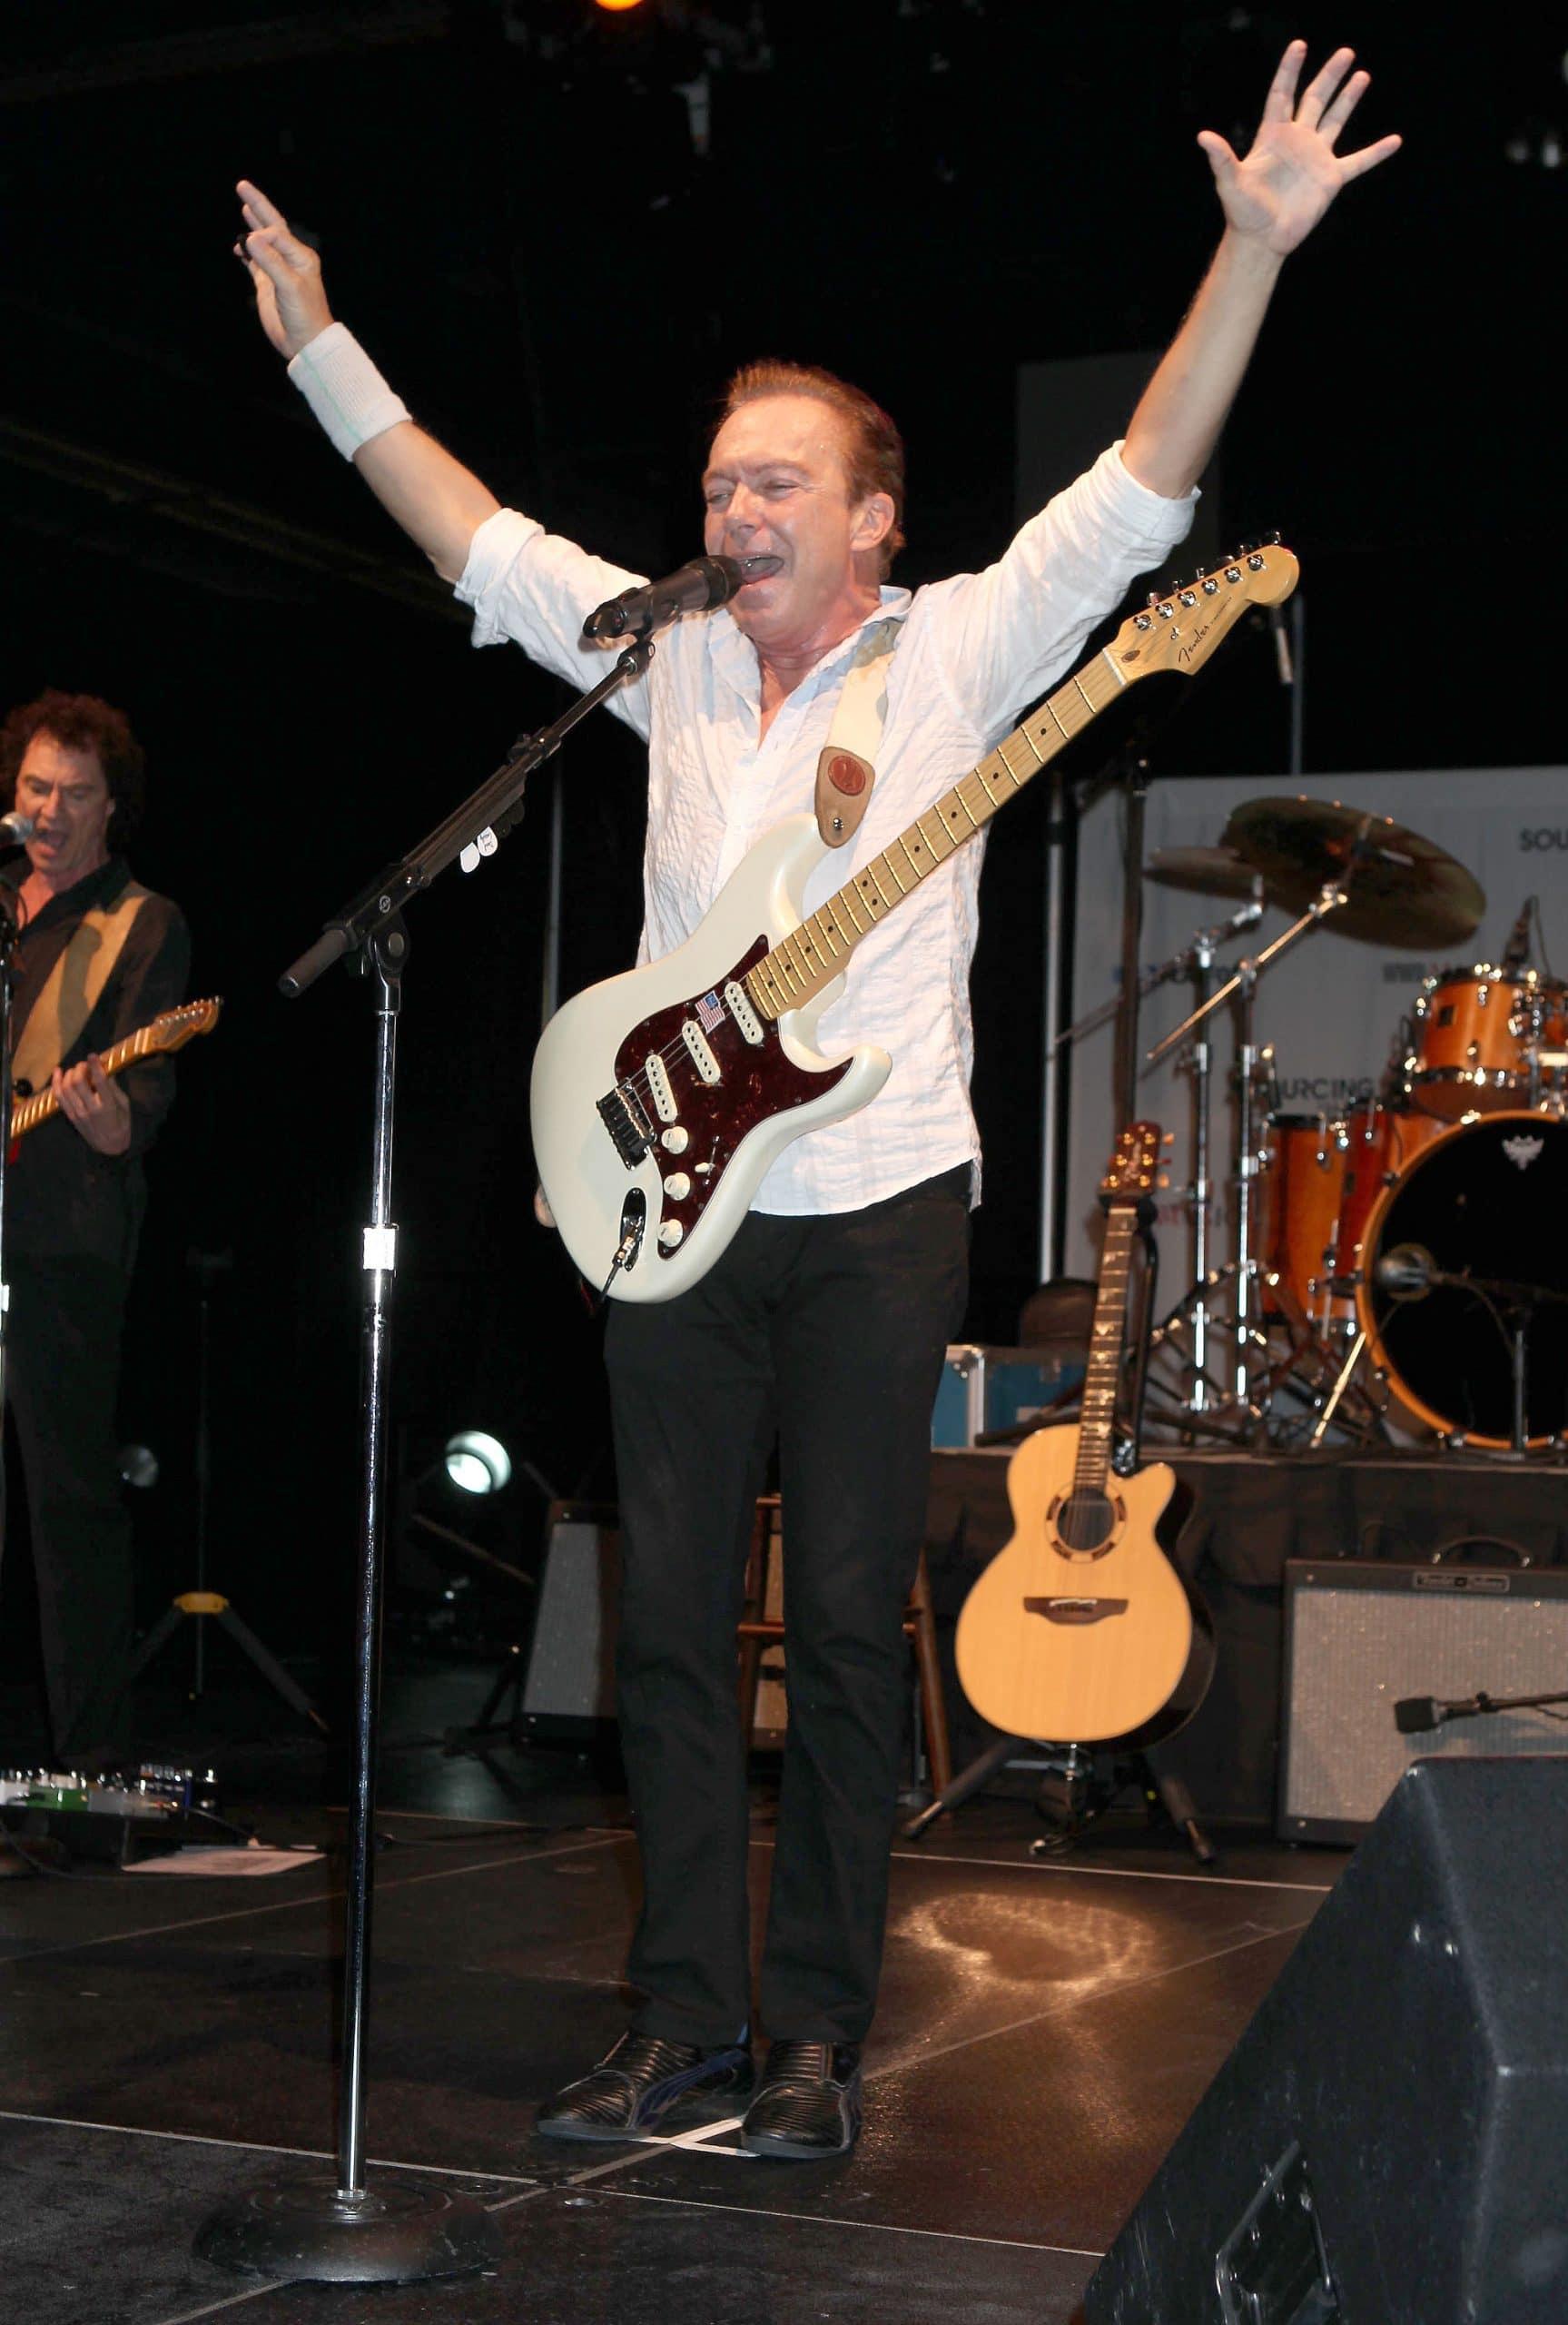 david cassidy performing